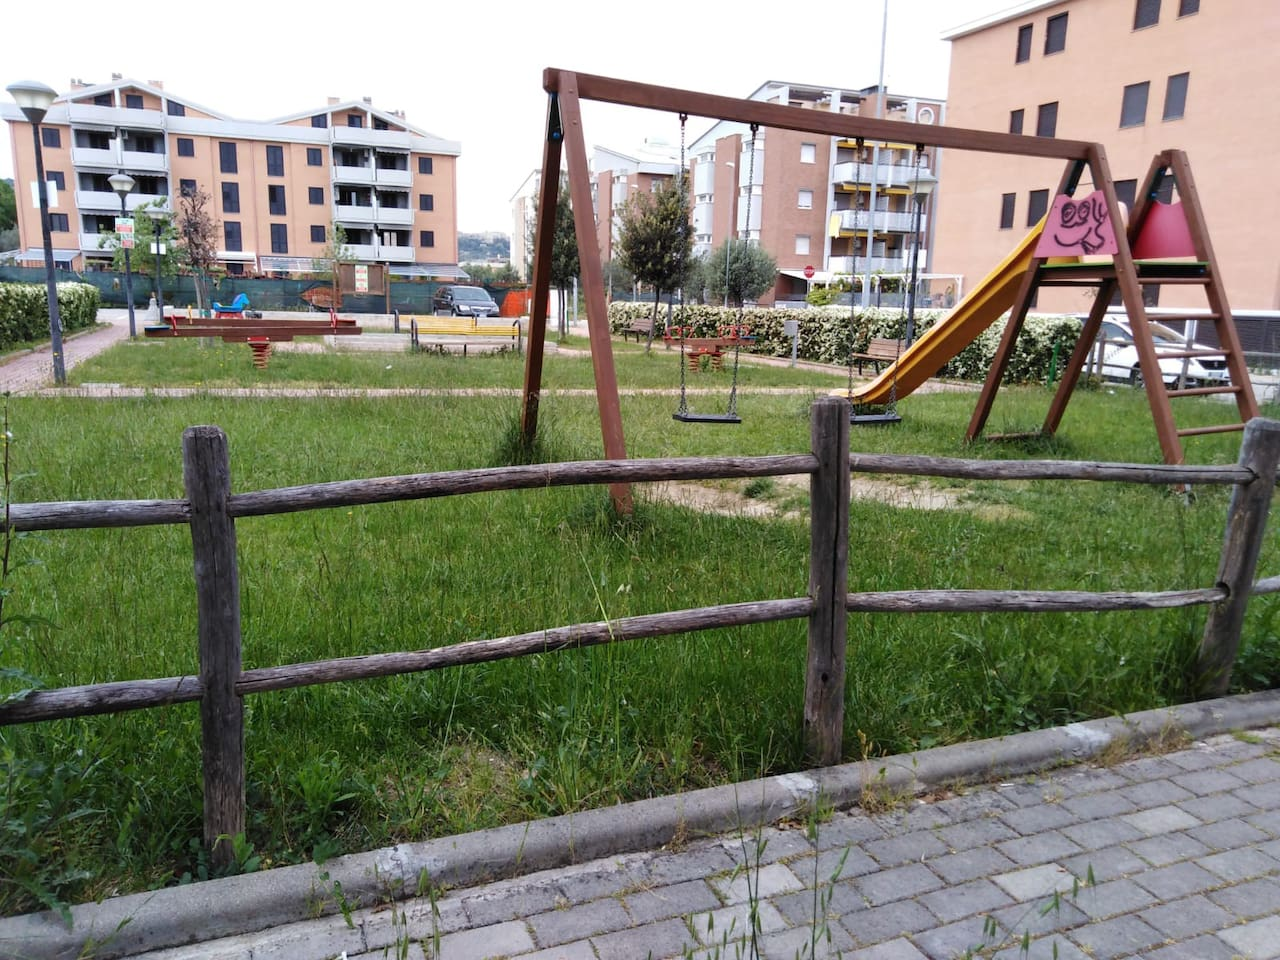 Parco giochi dietro l'angolo, Children's playground, behind the corner!